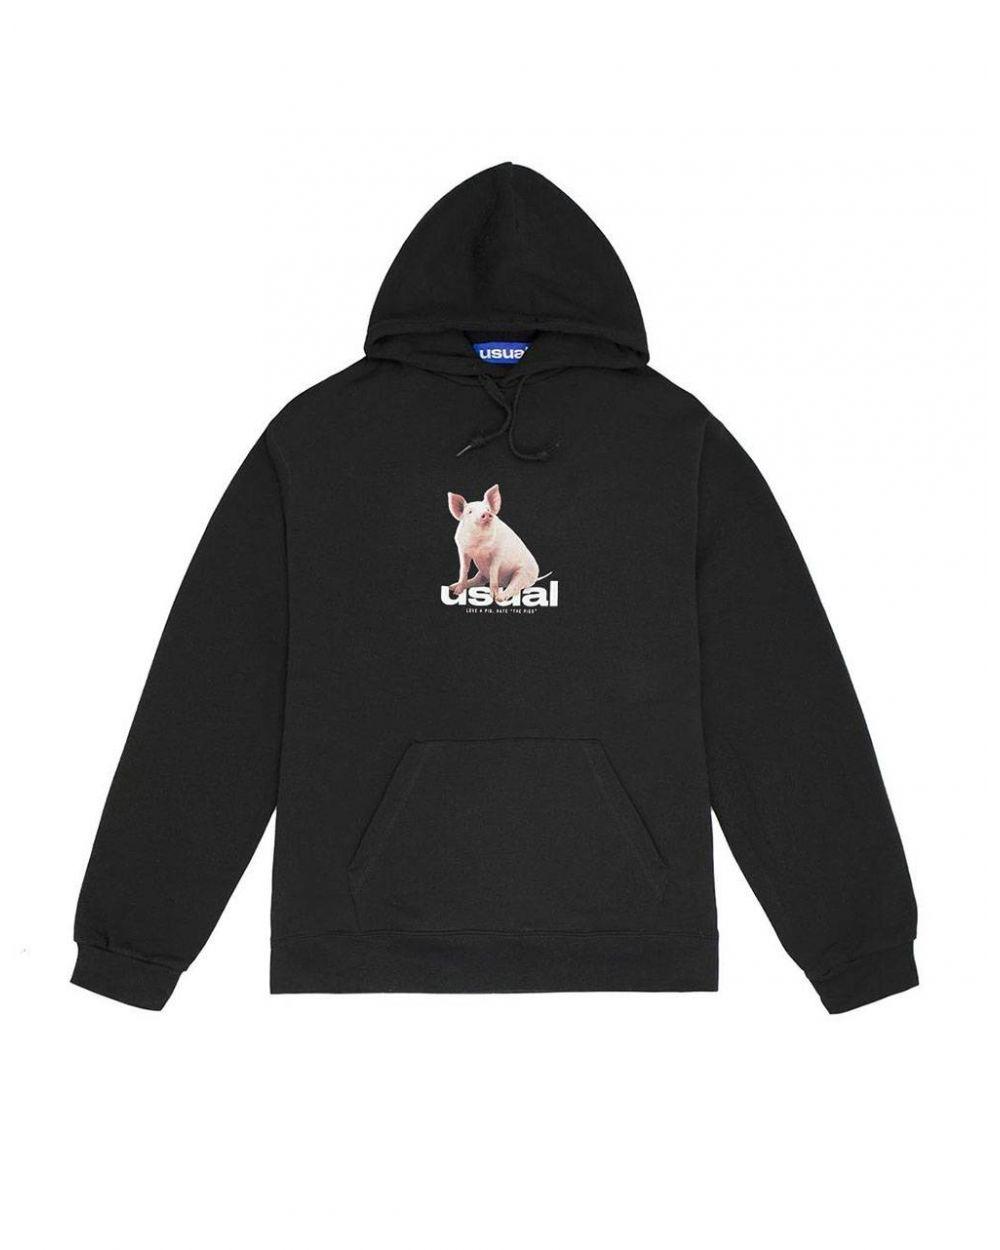 Usual Piggy Hooded Sweatshirt - black Usual Sweater 96,00€